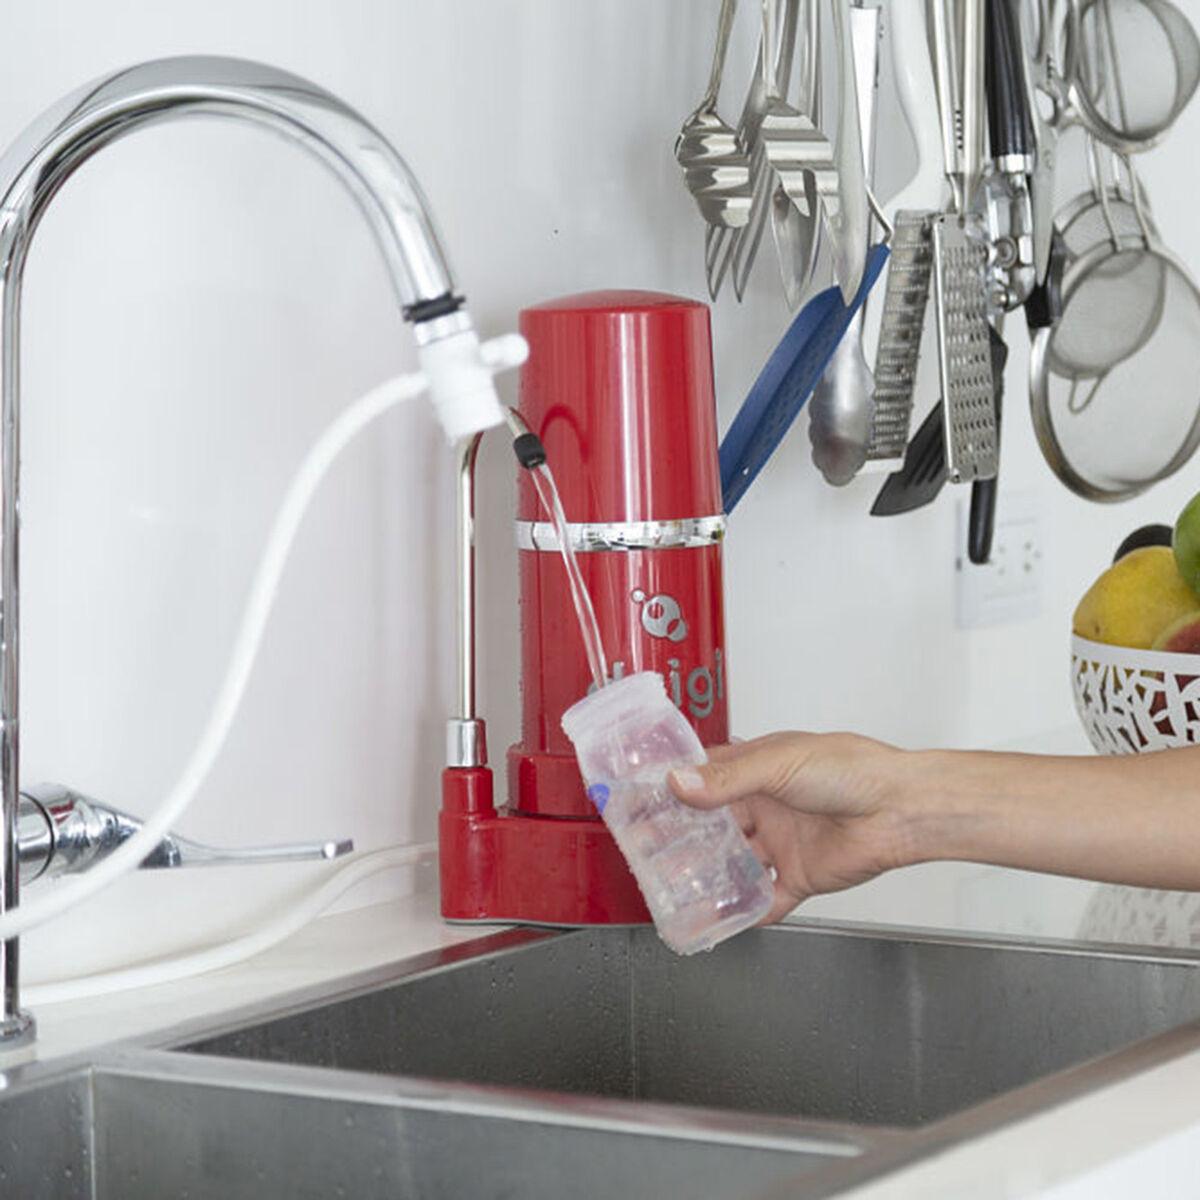 Purificador de Agua Filtro Sobre Cubierta + Botella Magnum Dvigi Rojo